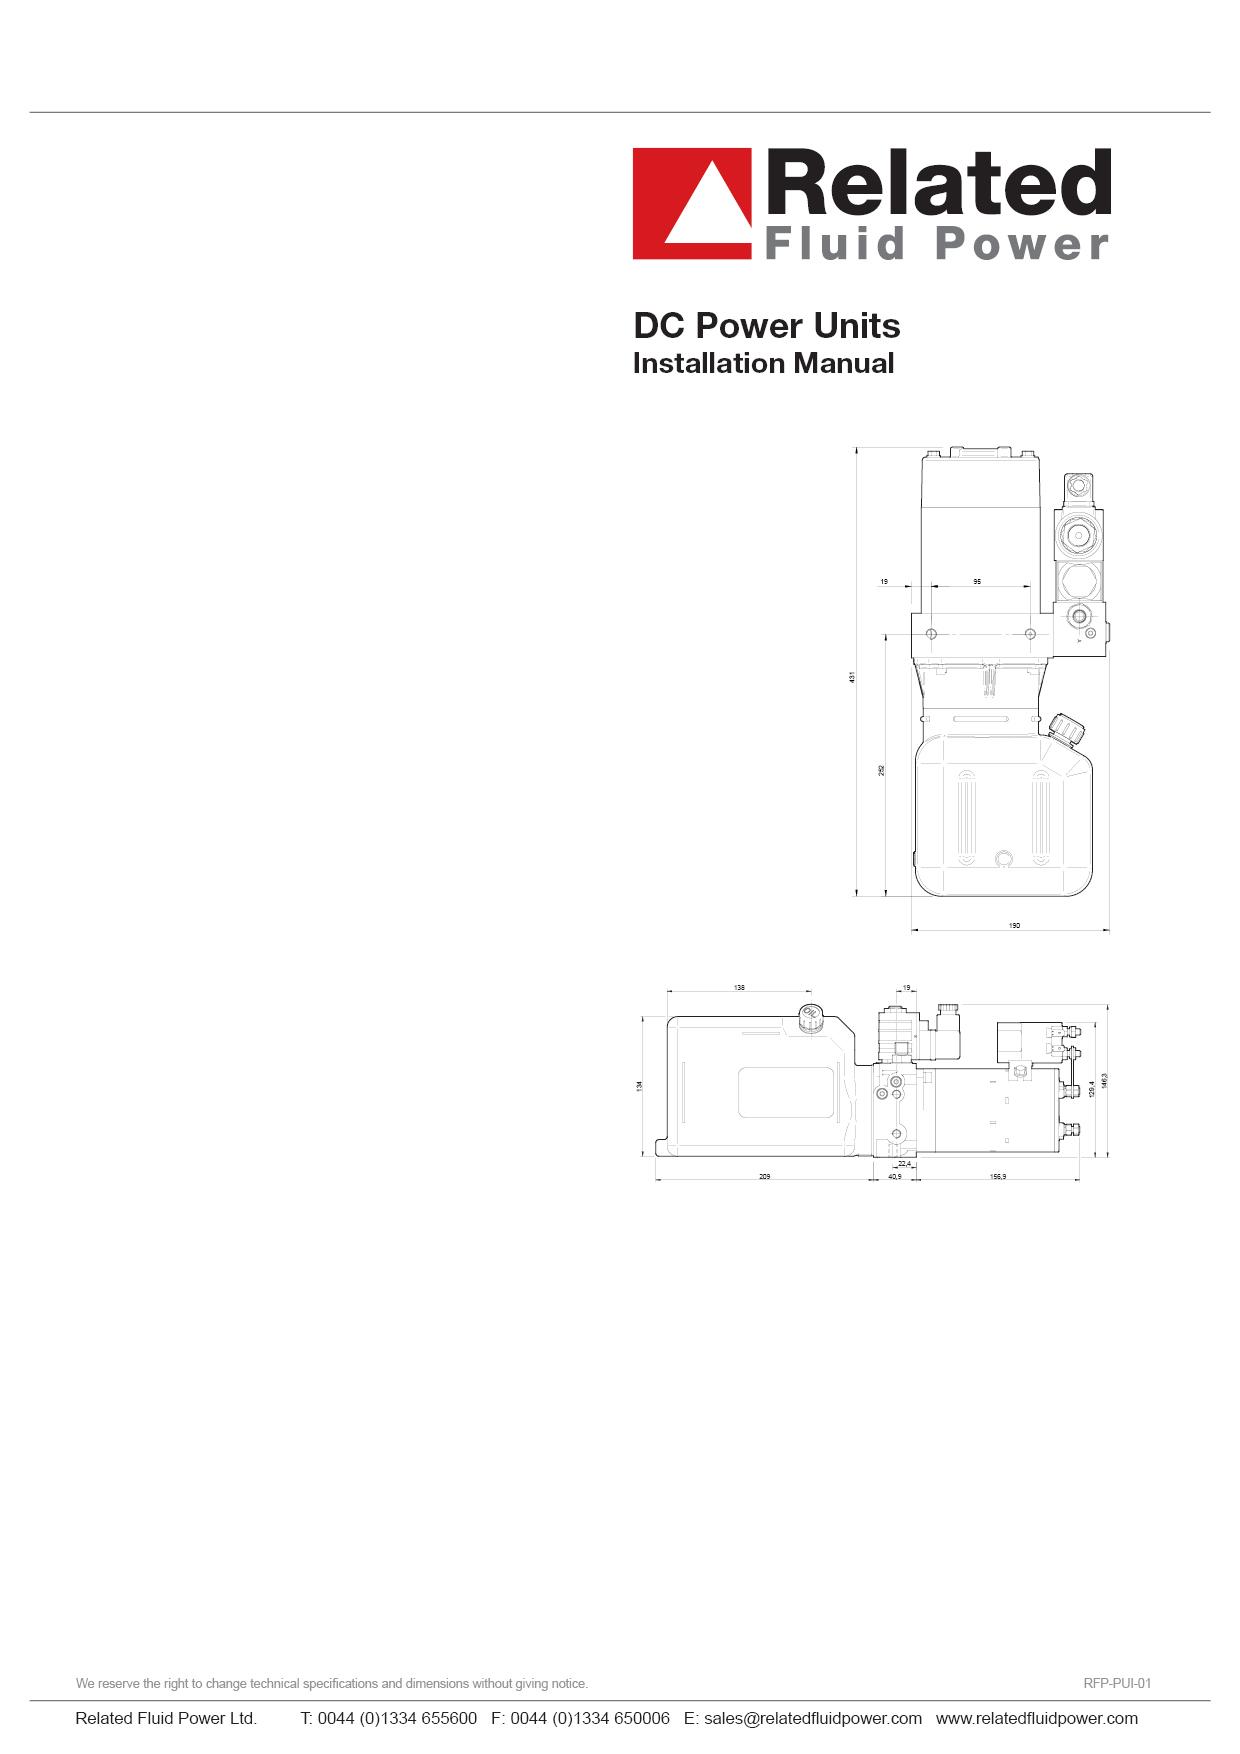 DC Power Units - Installation & Maintenance Manual